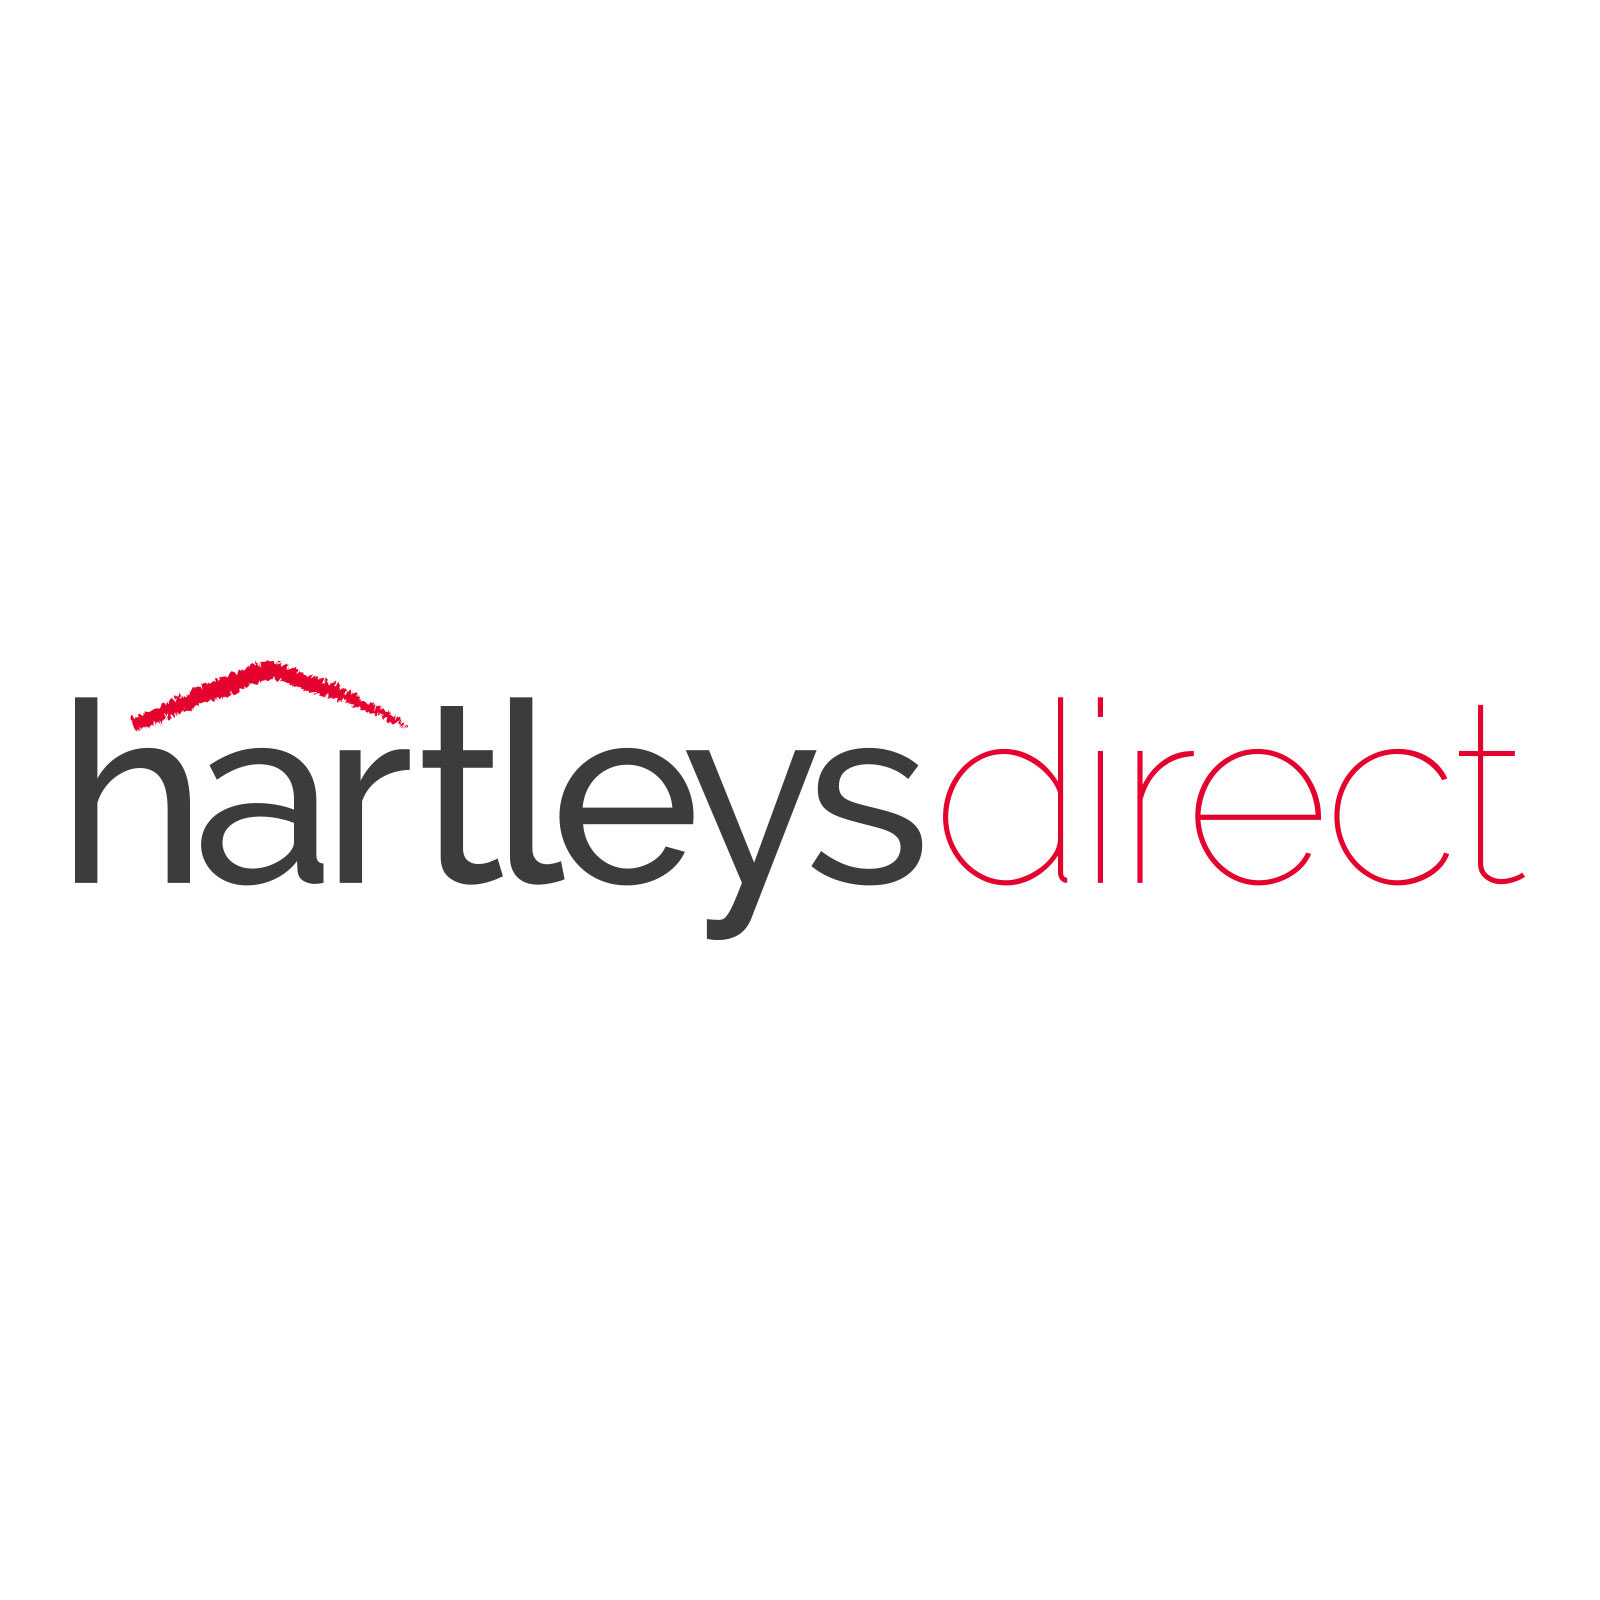 Hartleys-Copper-Bar-Stool-with-Backrest-Set-of-Four-on-White-Background.jpg